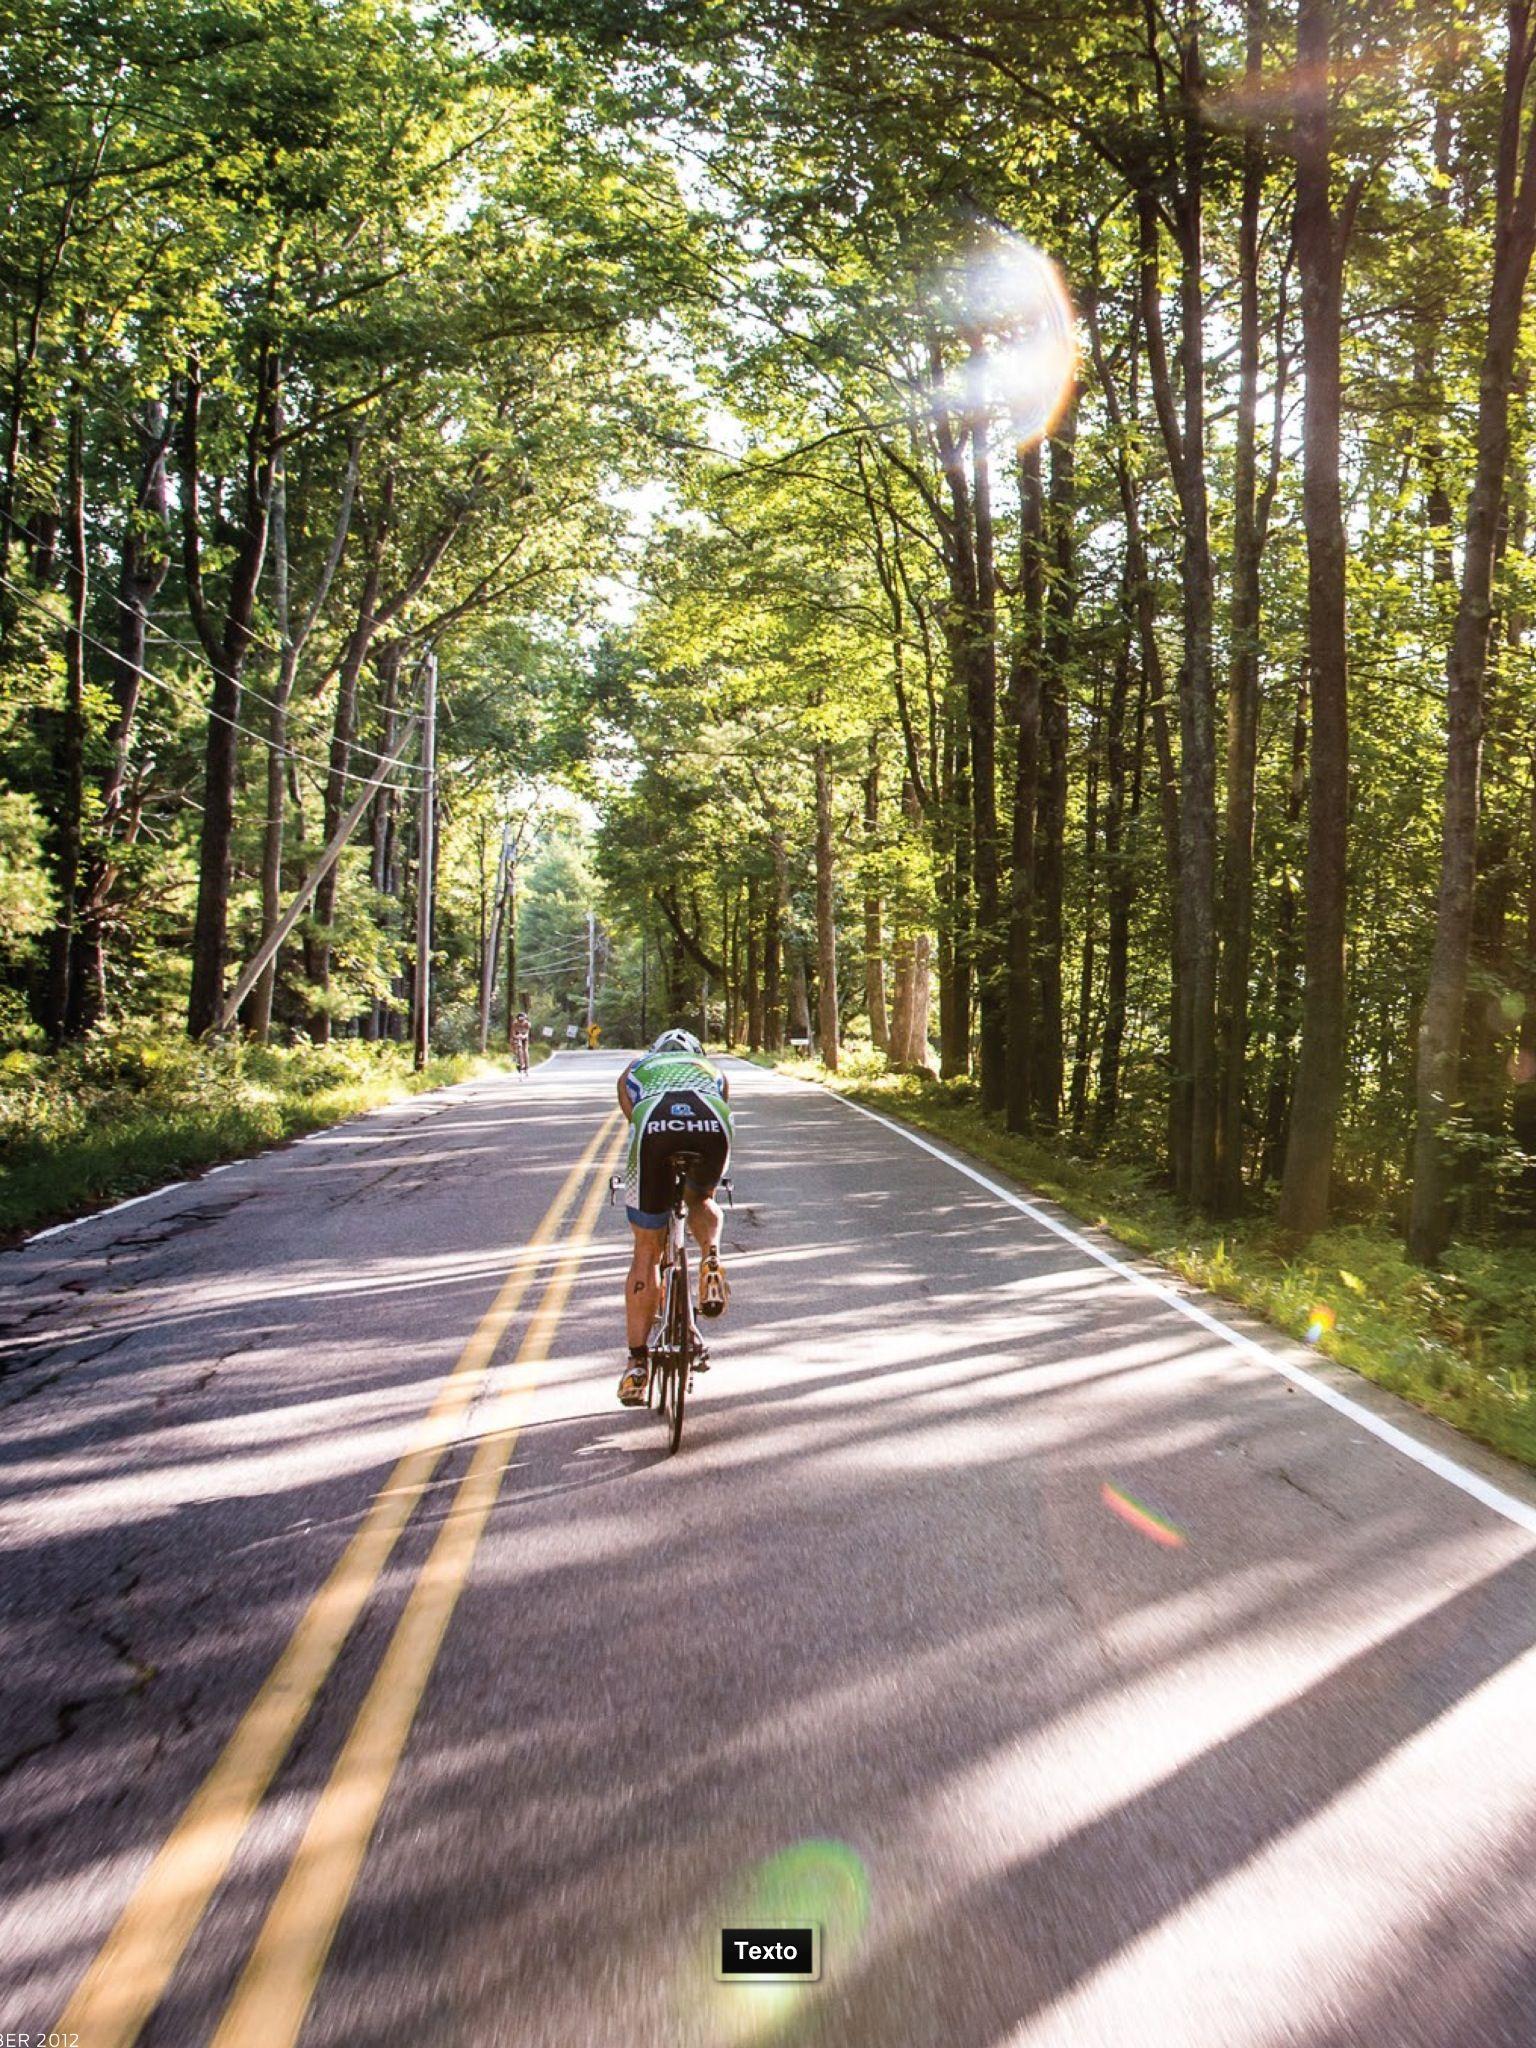 Pin By Micky Ribera On Sport Bike Life Road Bike Bike Lovers